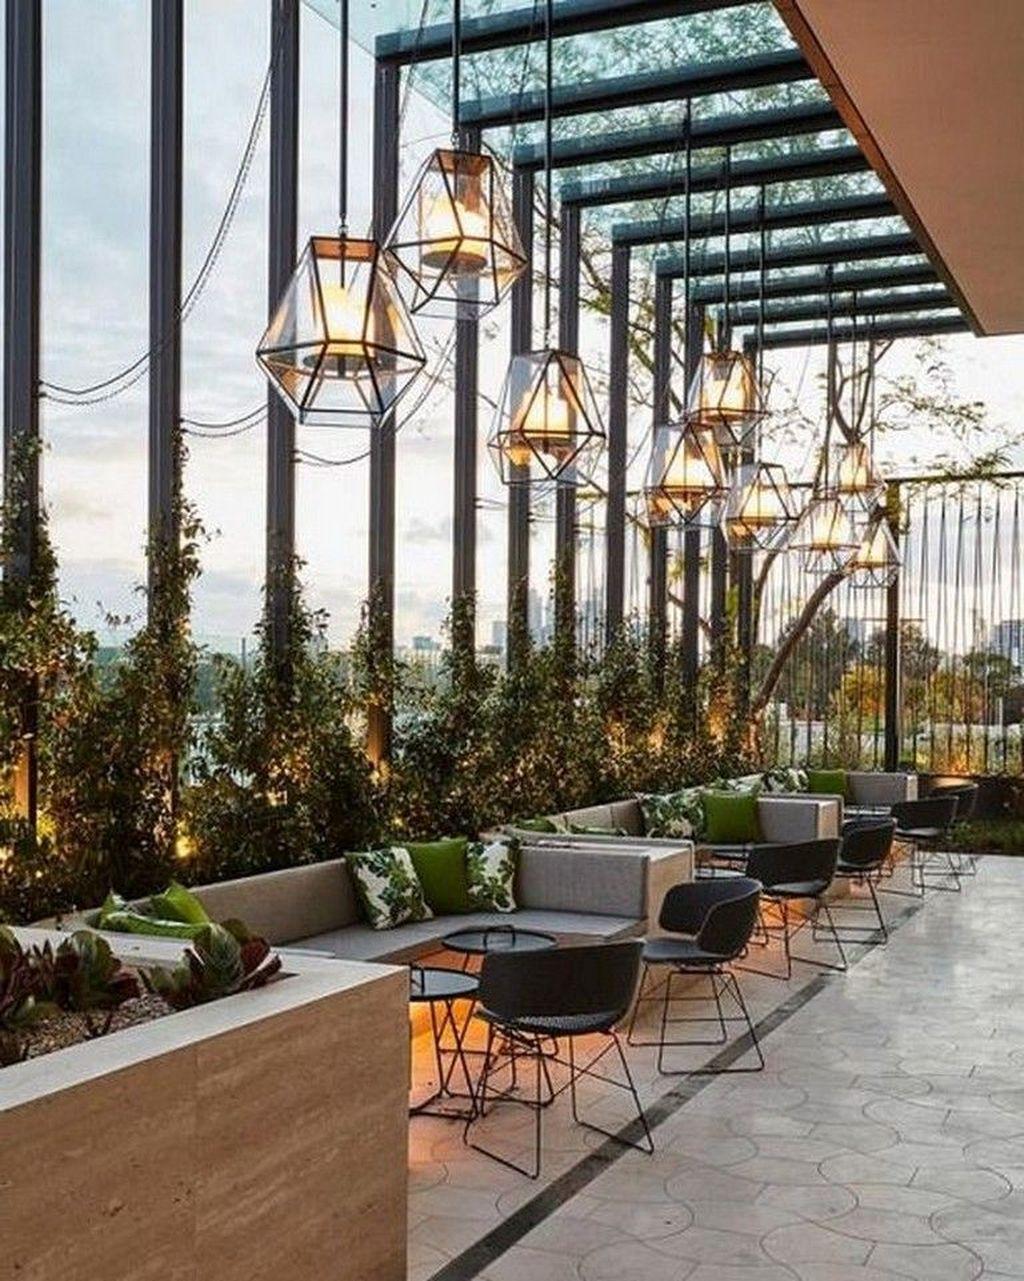 45 pretty outdoor restaurant patio design ideas for